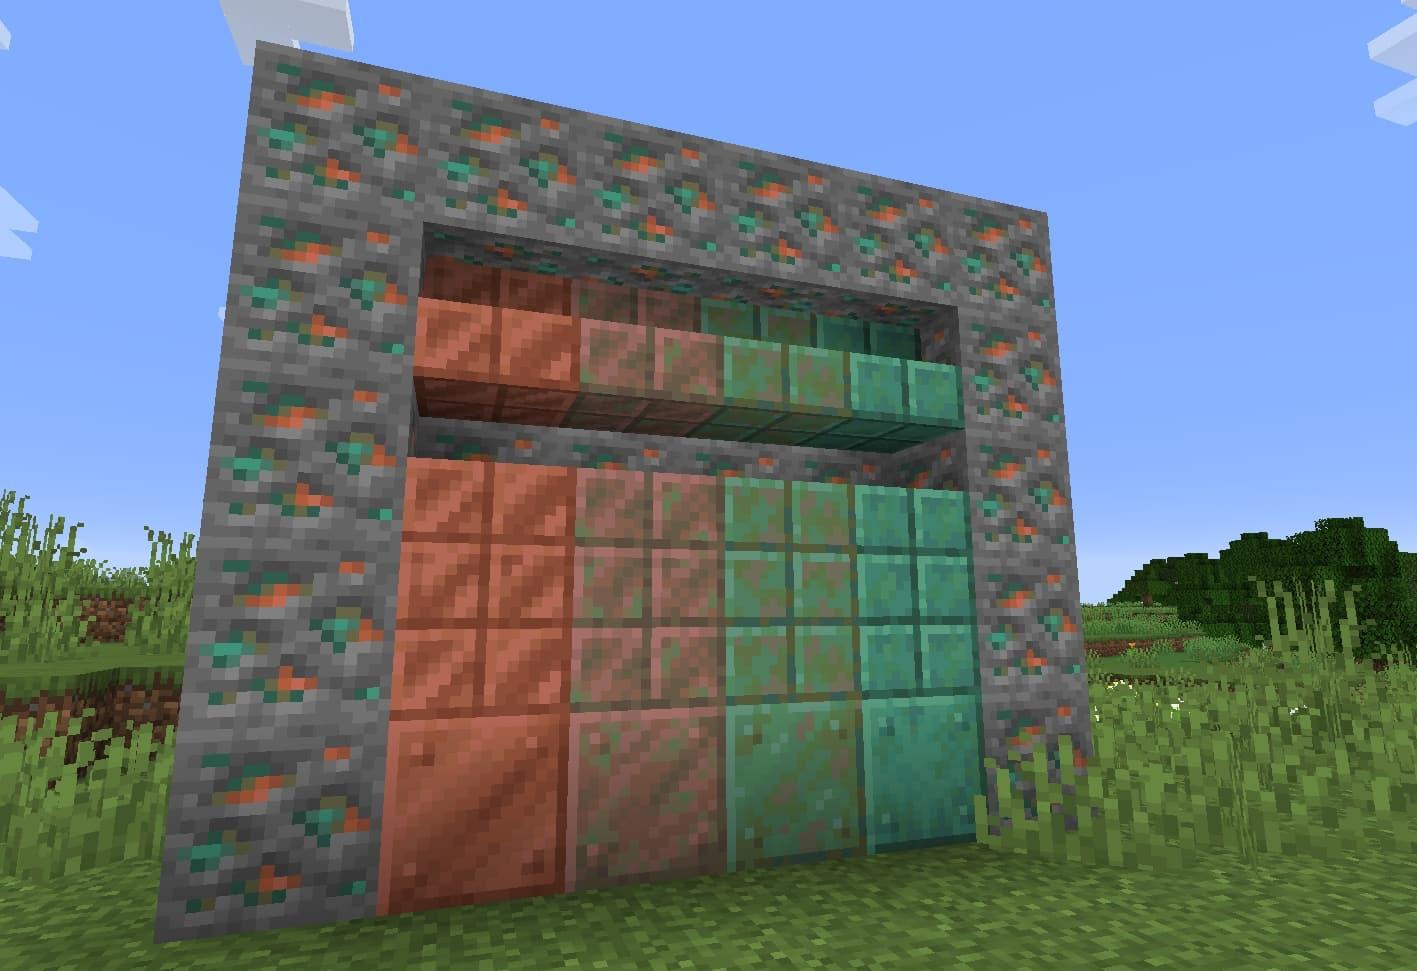 Minecraft 1.17 - Cuivre